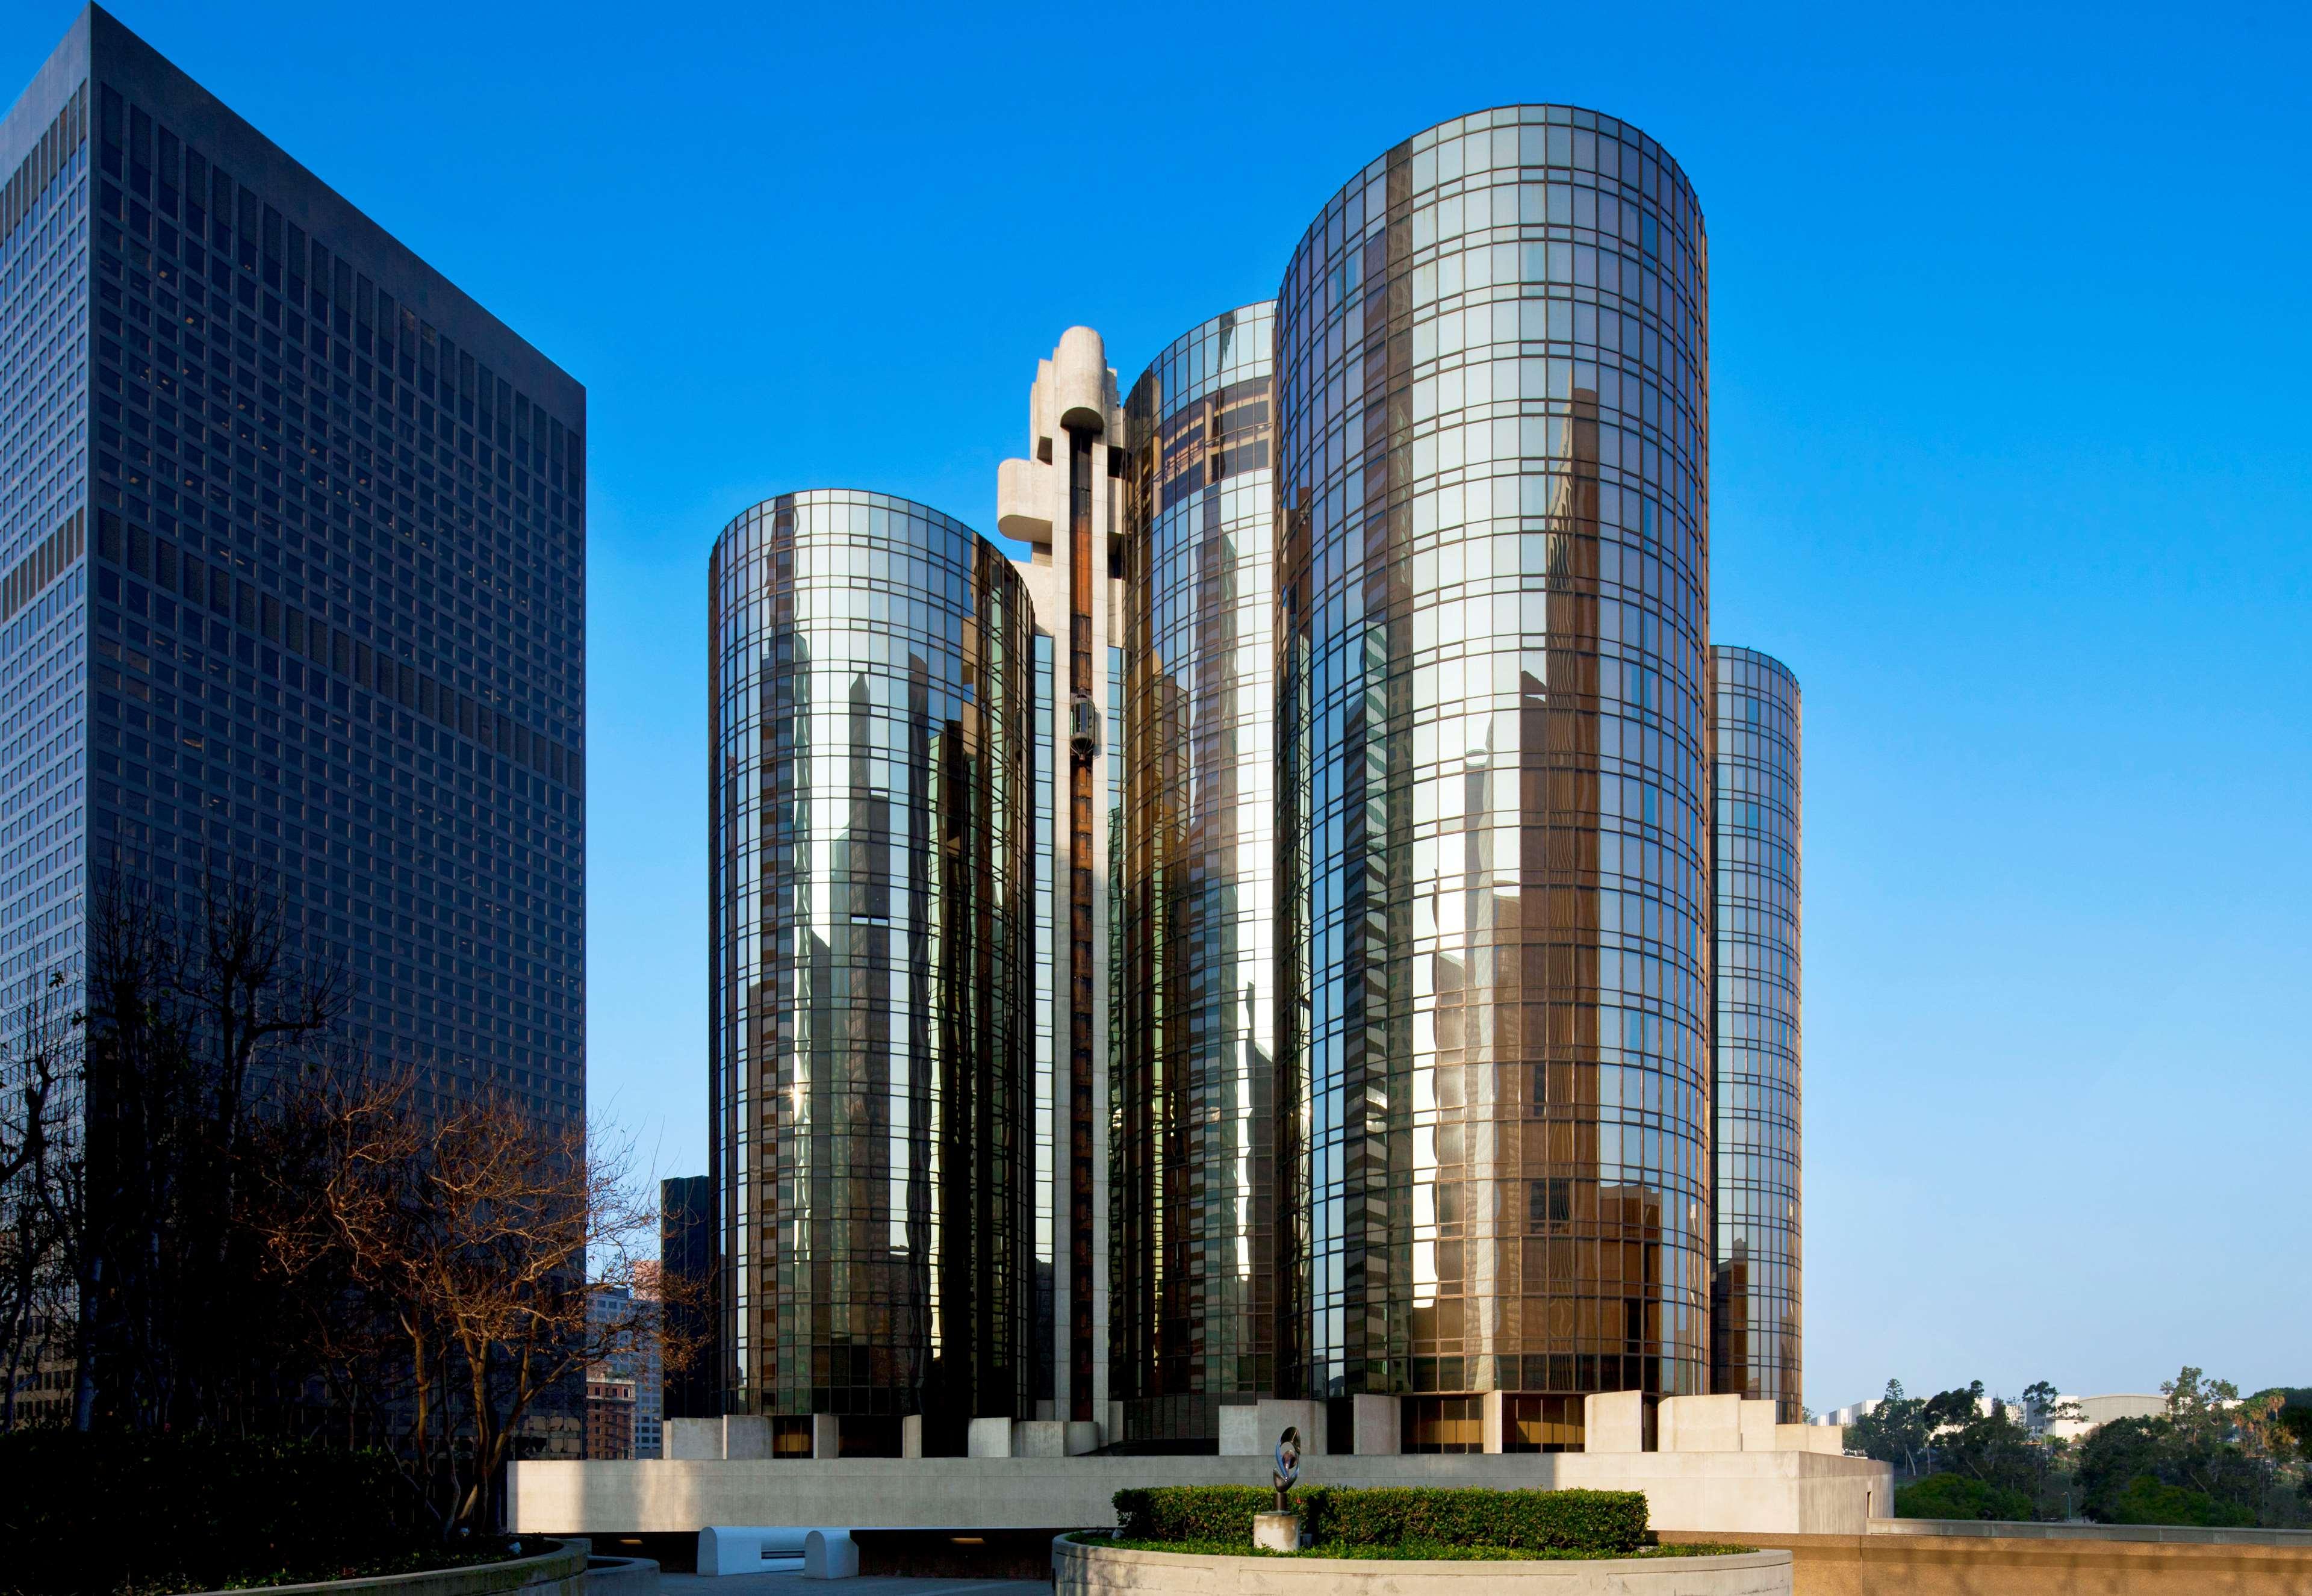 The Westin Bonaventure Hotel & Suites, Los Angeles image 2